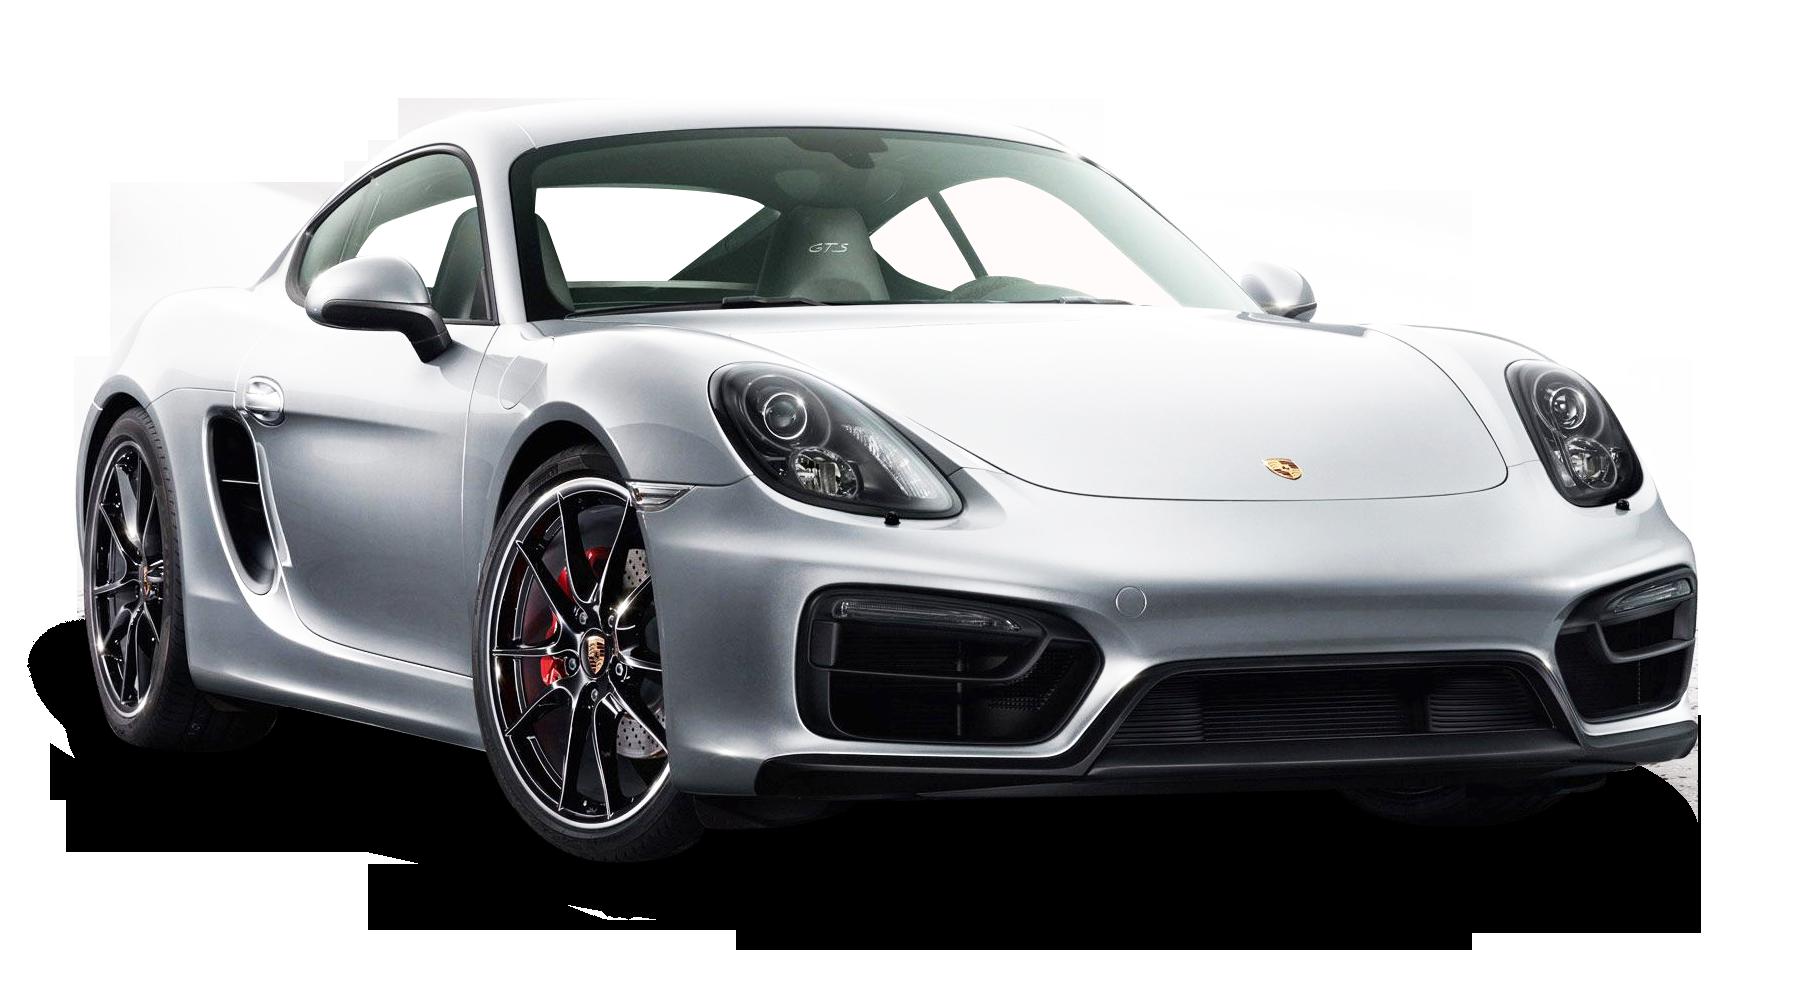 White Porsche Cayman GTS Car